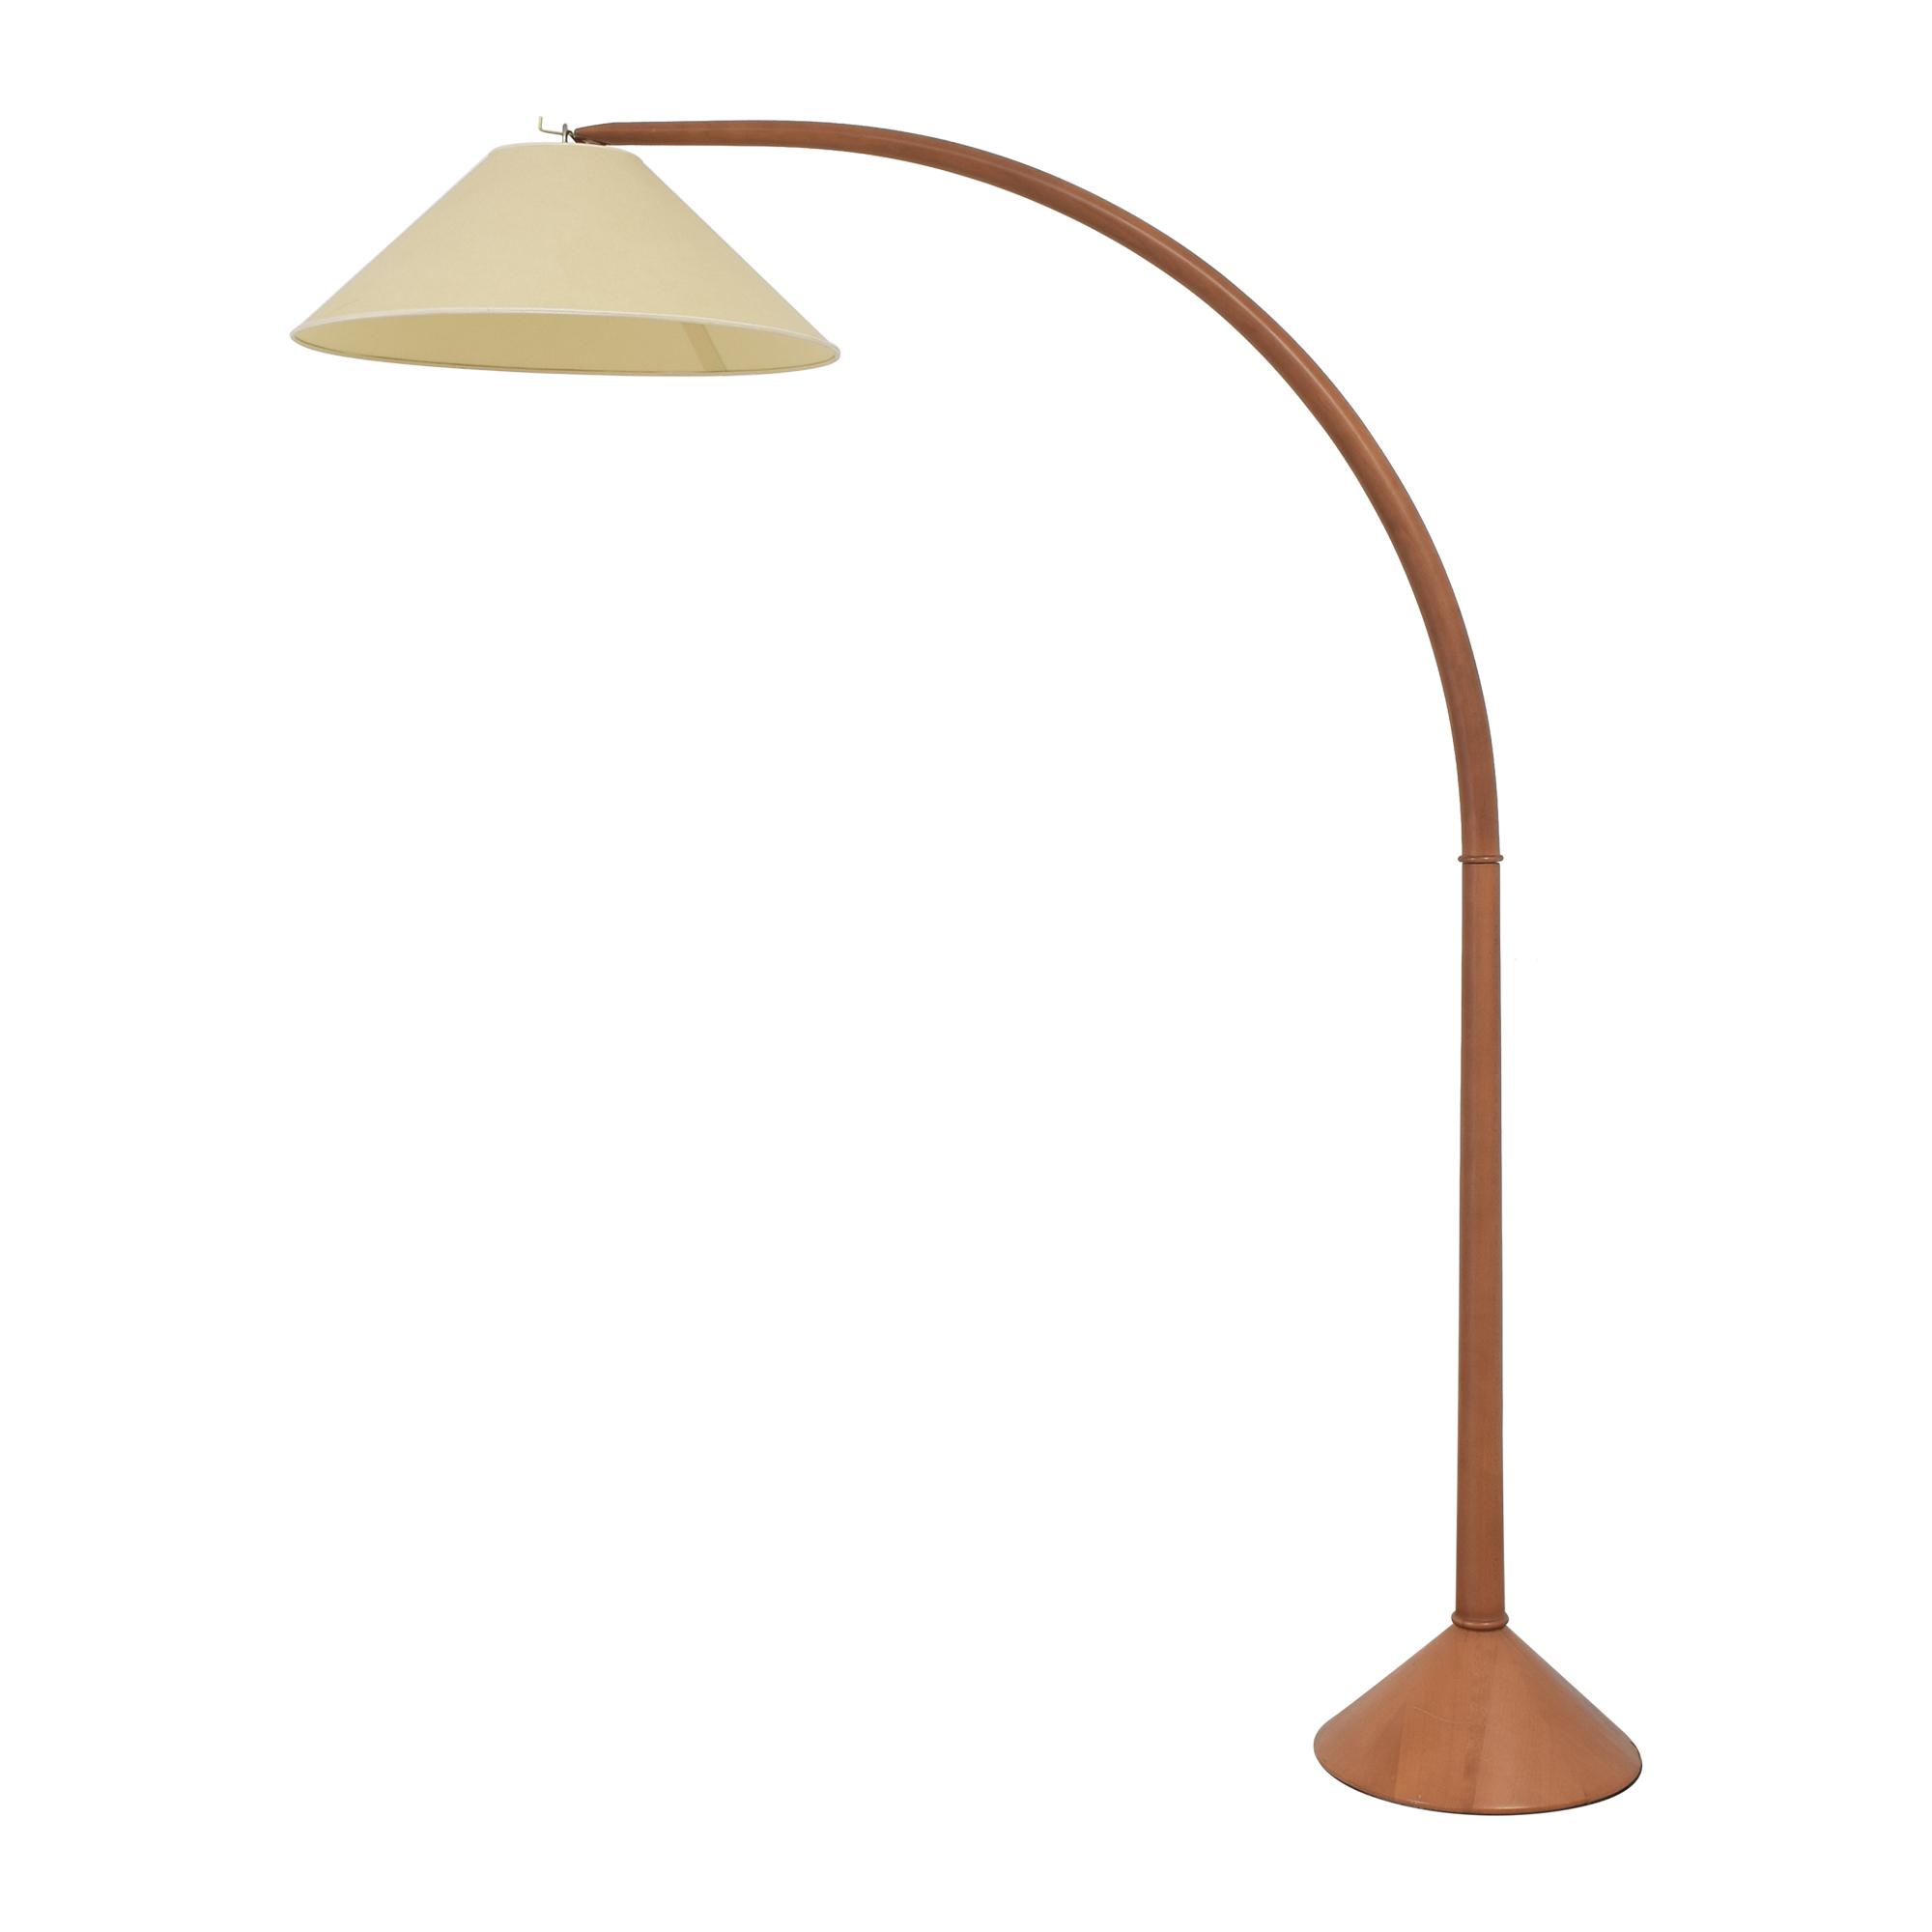 Penta Kelly Arc Floor Lamp / Lamps